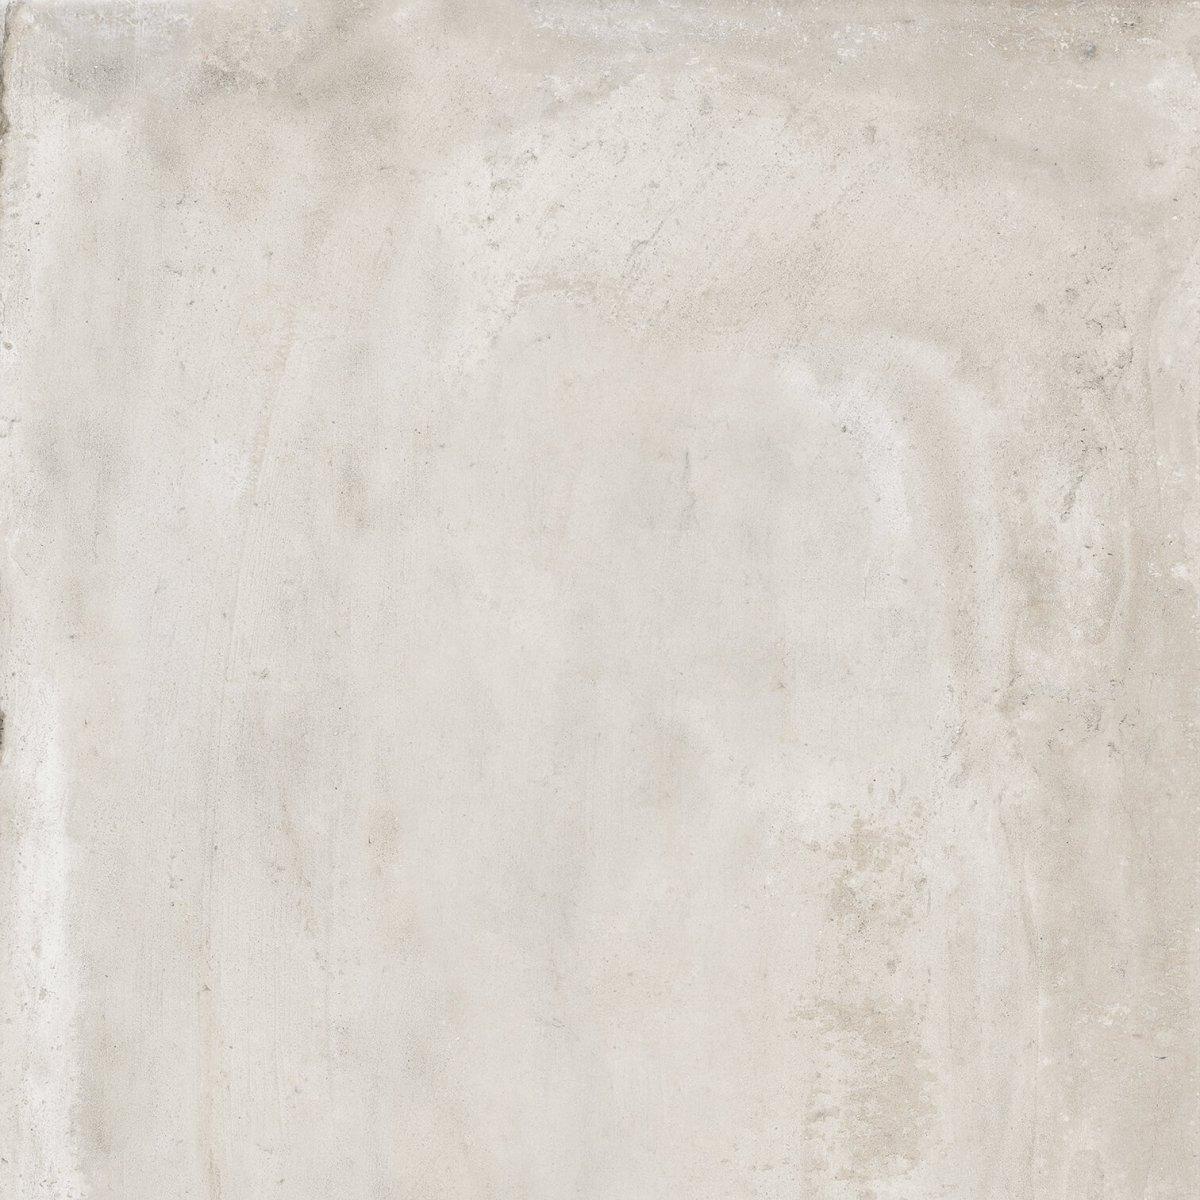 Florim Beton One Chalk 600x600mm_Stiles_Product_Image3